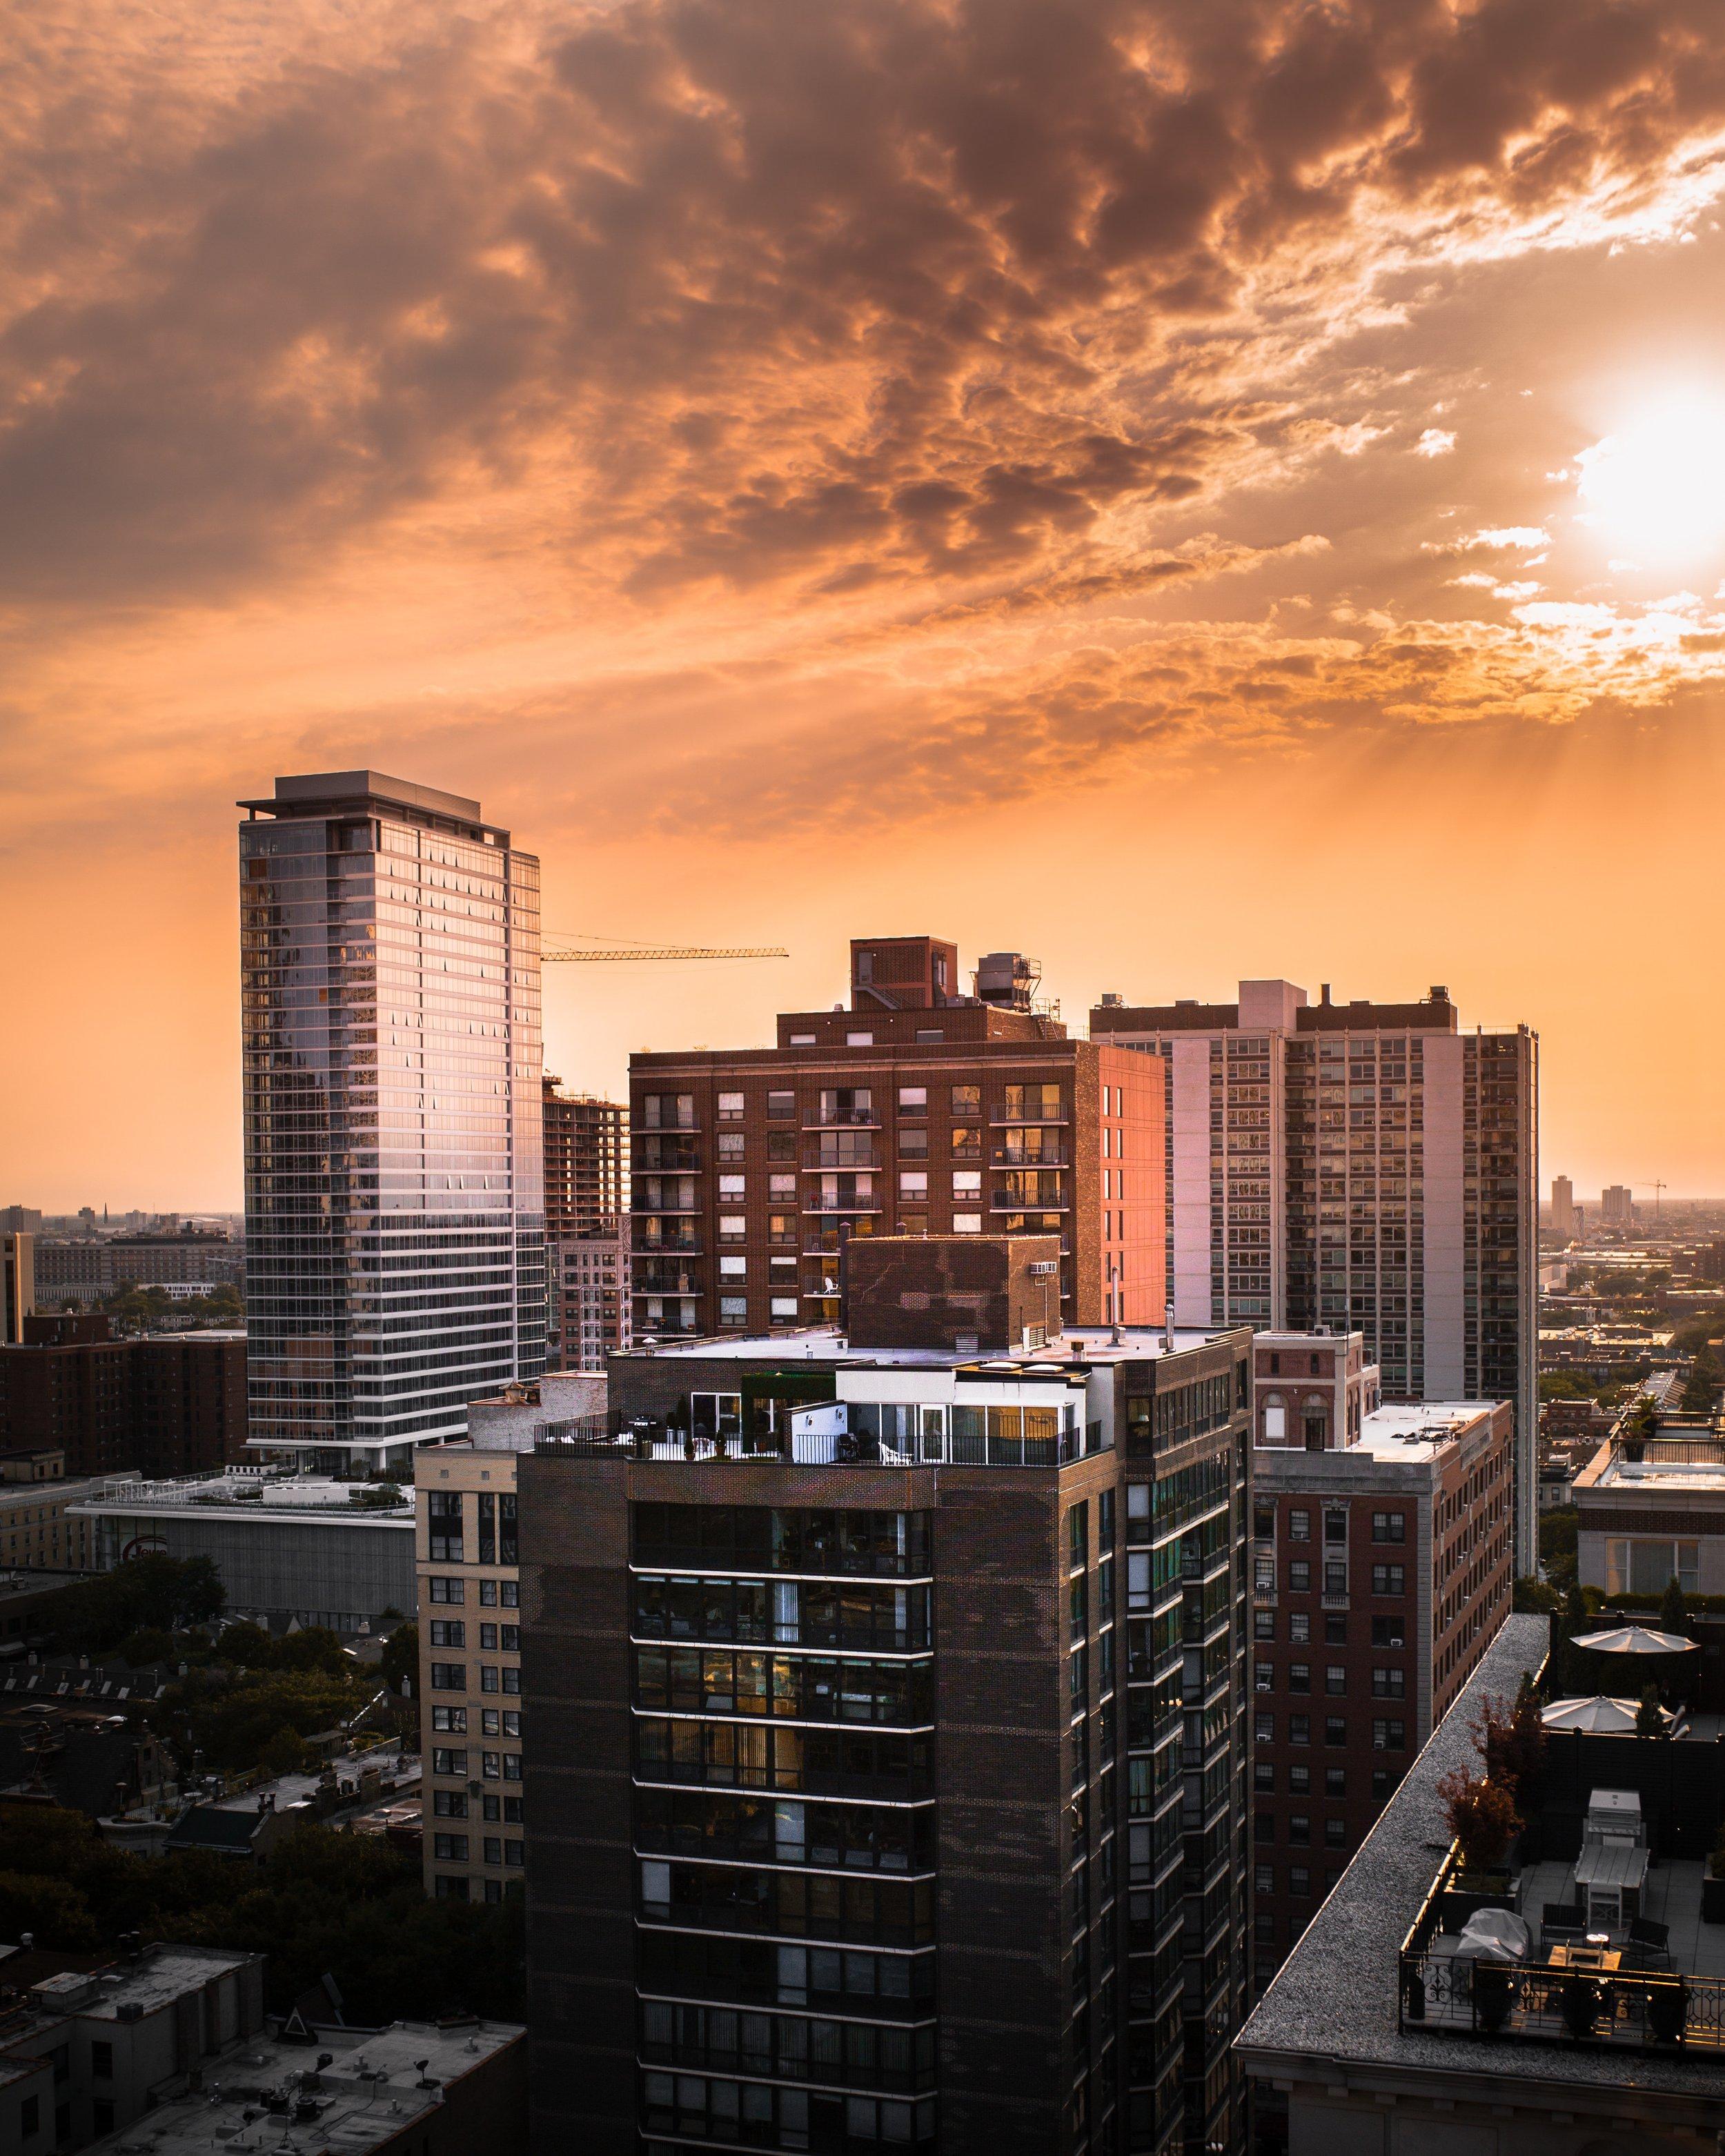 apartment-buildings-architecture-bird-s-eye-view-1707826.jpg